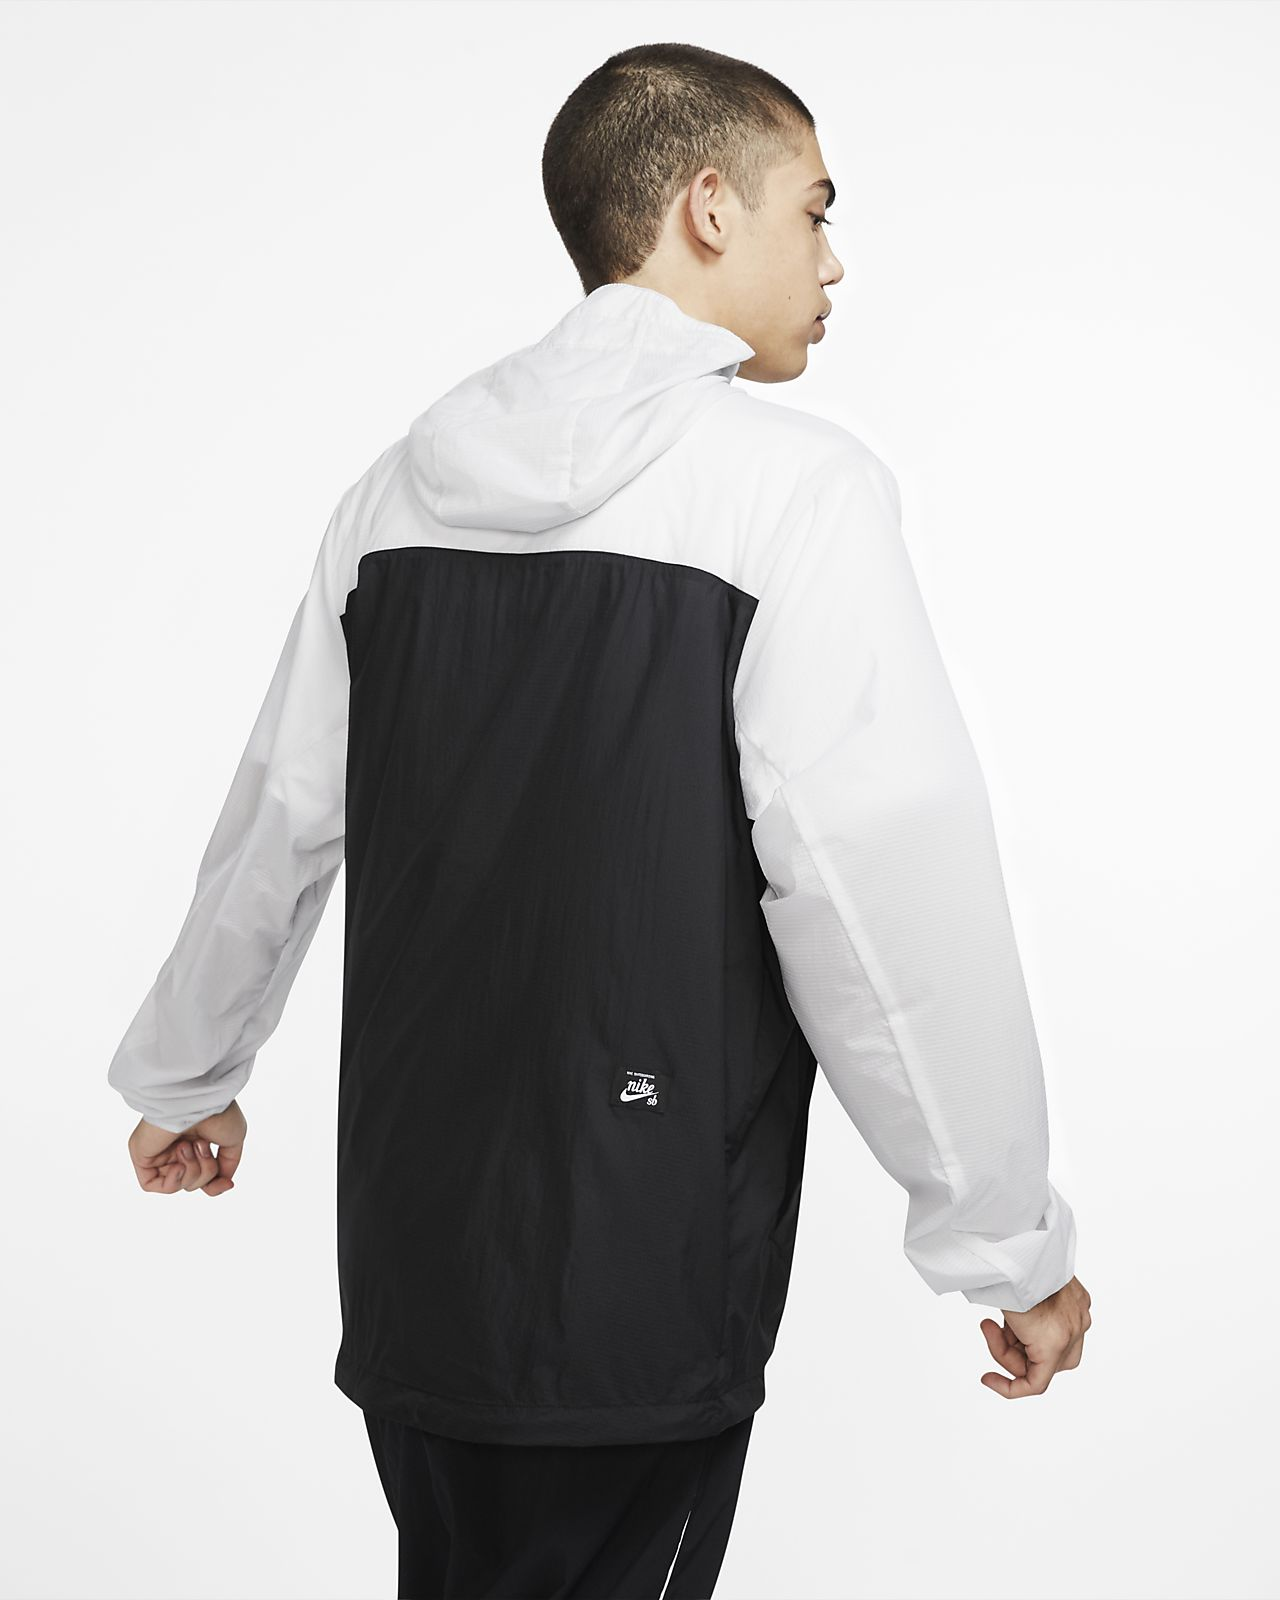 Nike Su19 Jacke Schwarz Herren Bekleidung Jacken